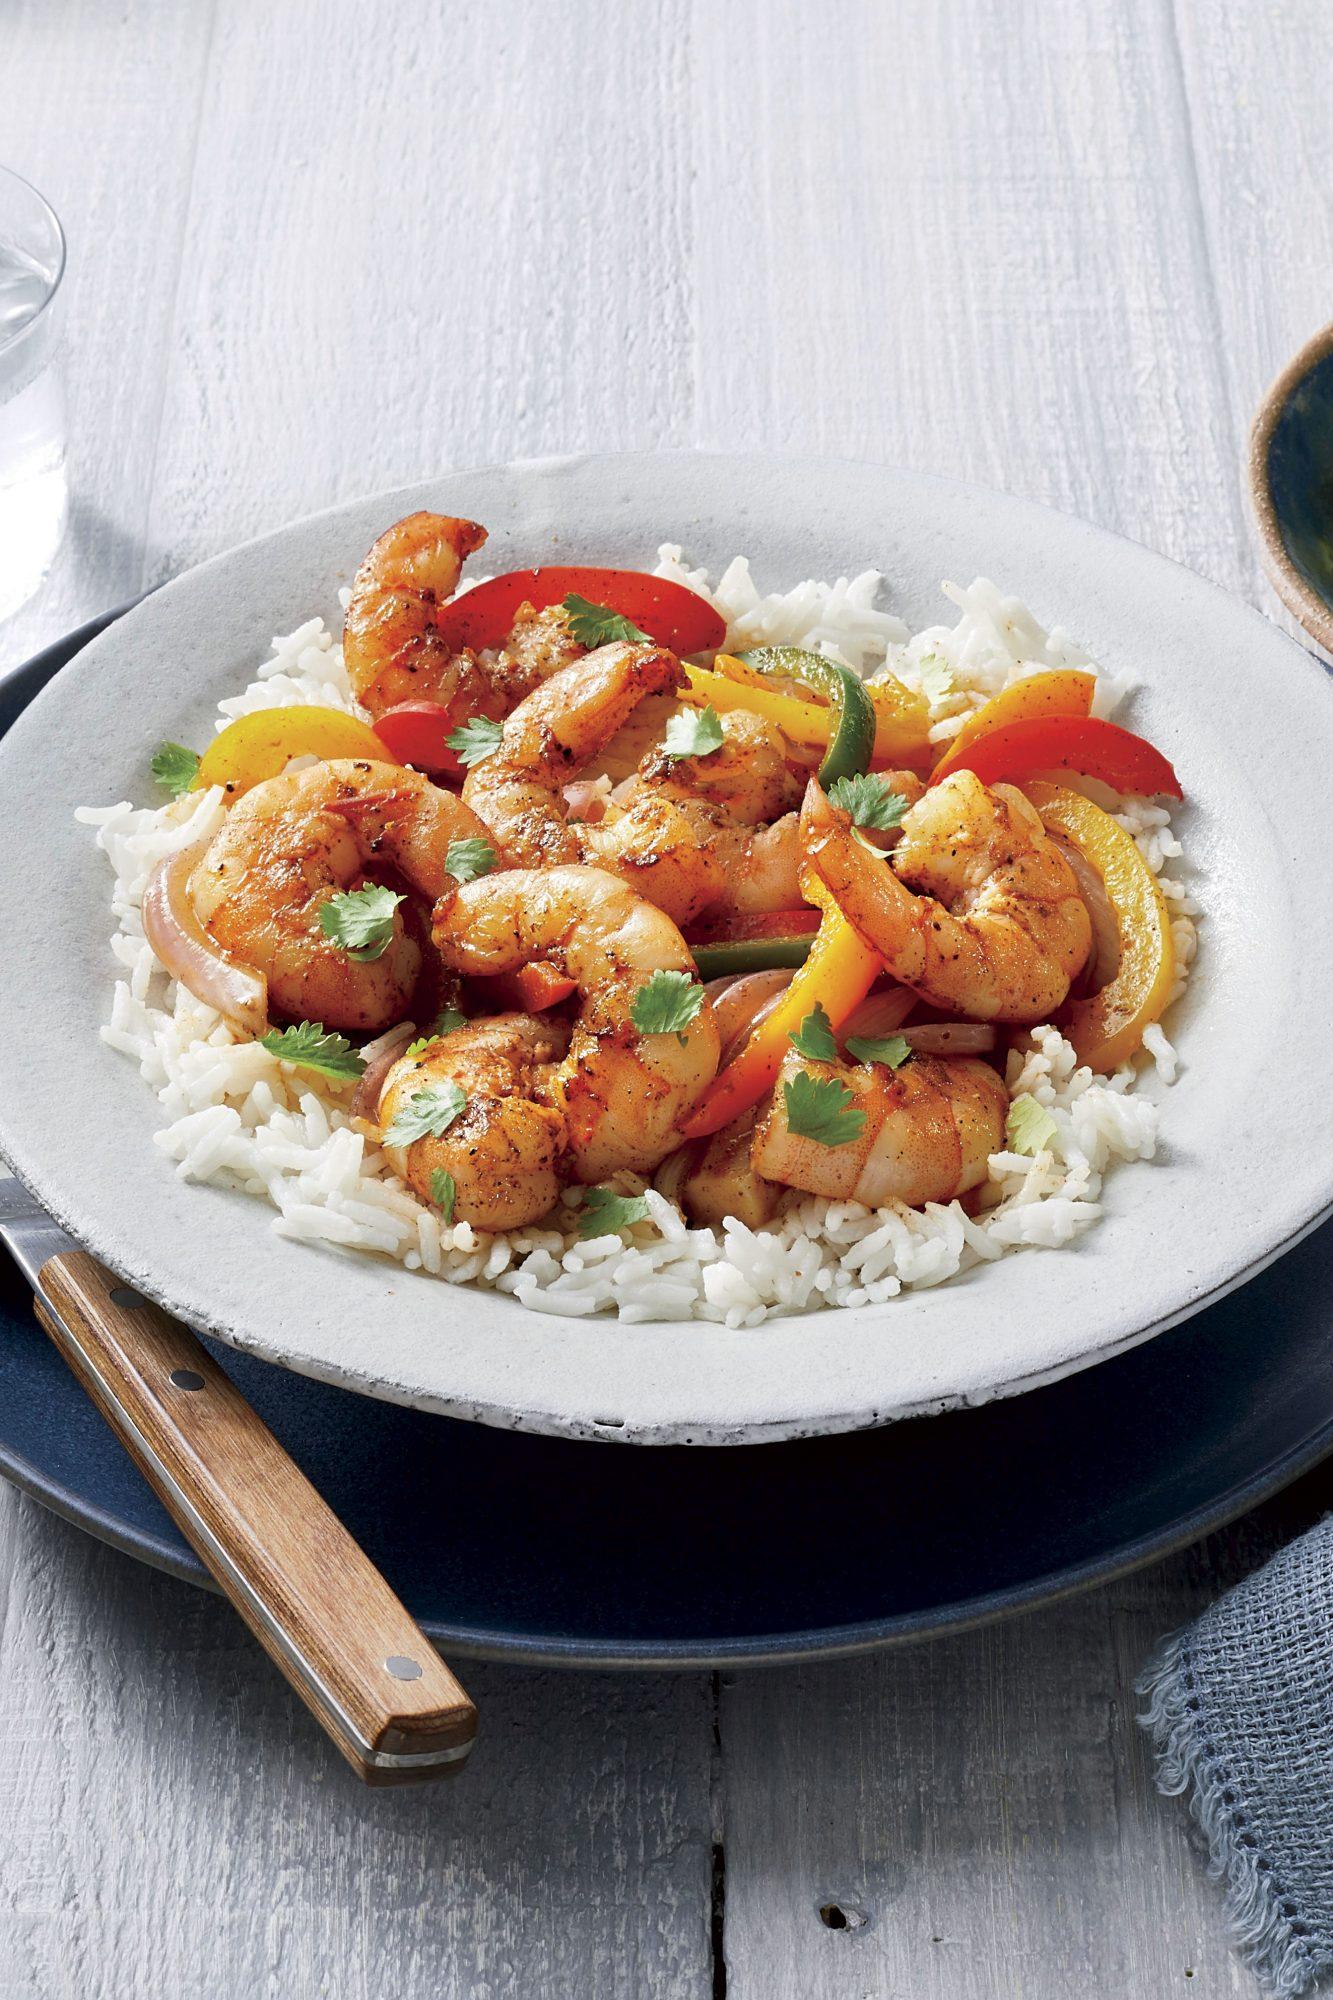 Shrimp Fajita Bowls